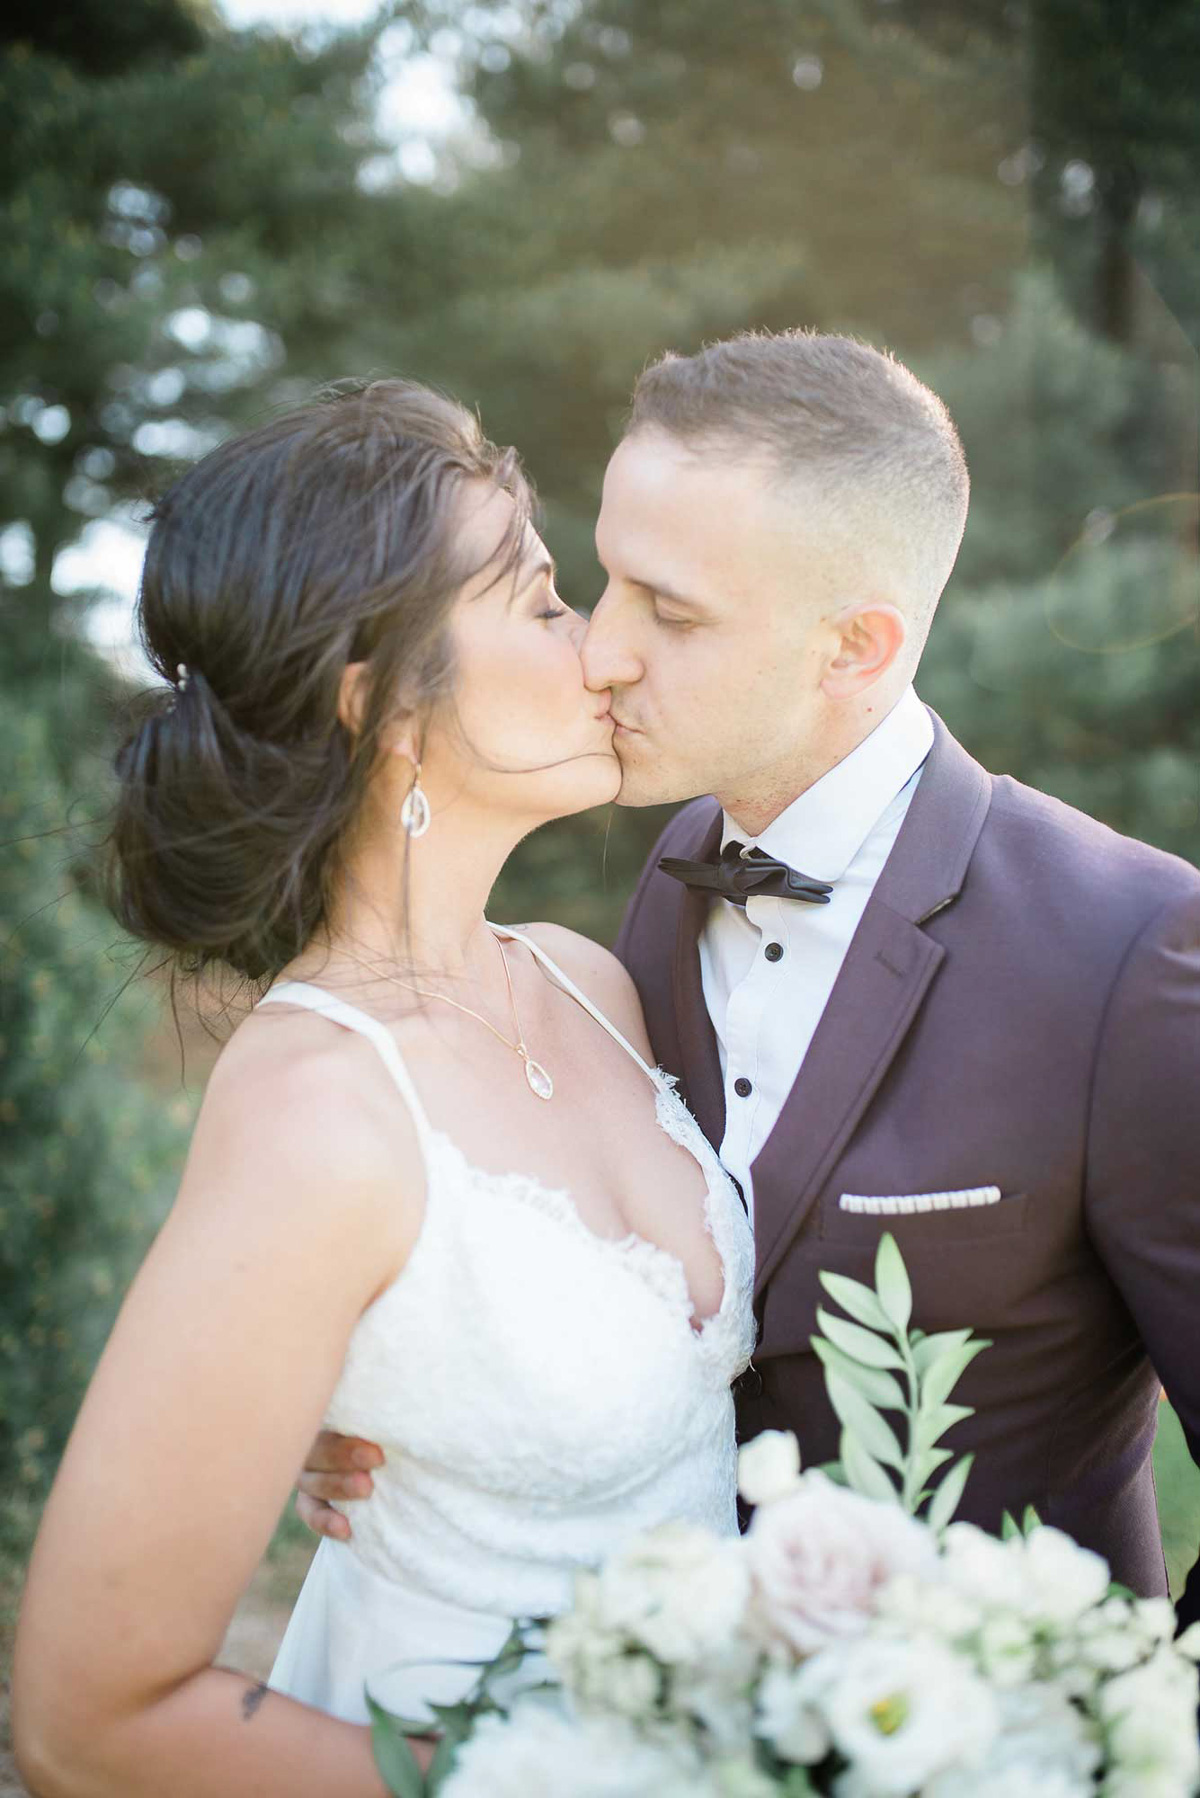 destiny-dawn-photography-vineyard-bride-swish-list-knollwood-golf-and-country-club-ancaster-wedding-editorial-20.jpg